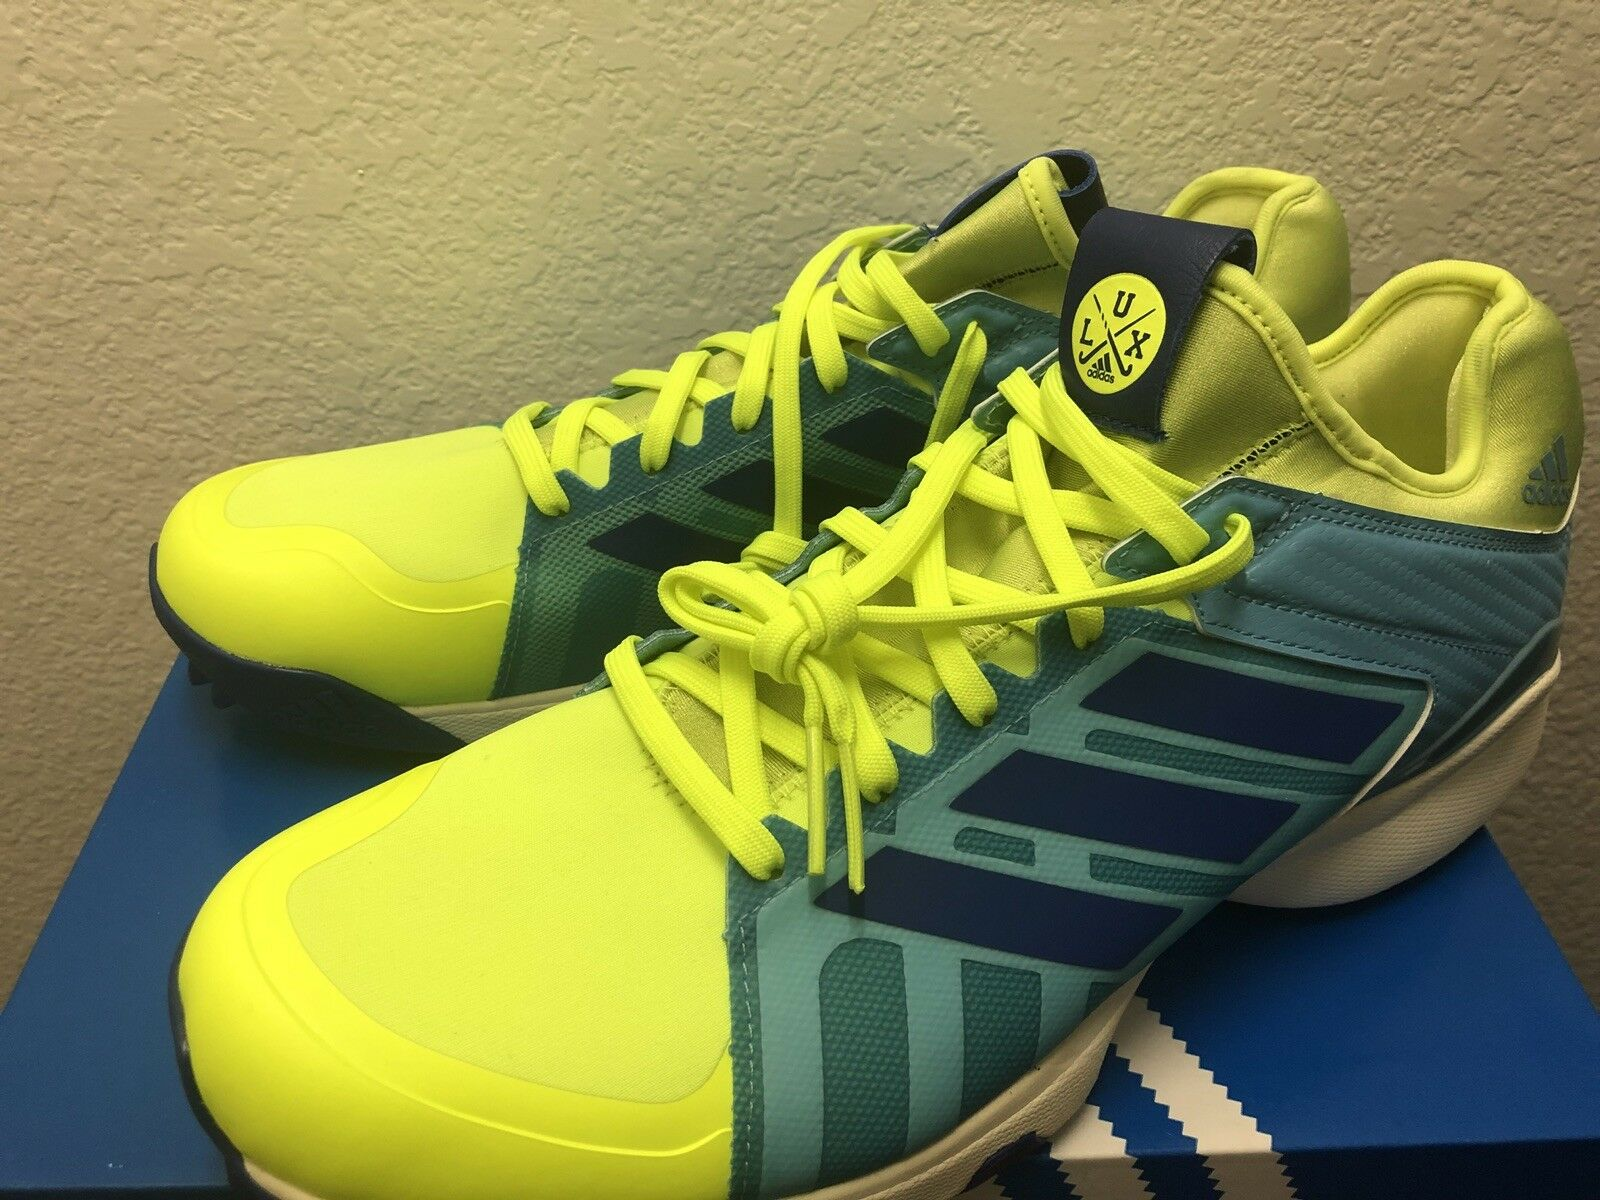 Adidas performance - männer lux feldhockey schuh - performance größe 11 aq6510 5d20f4